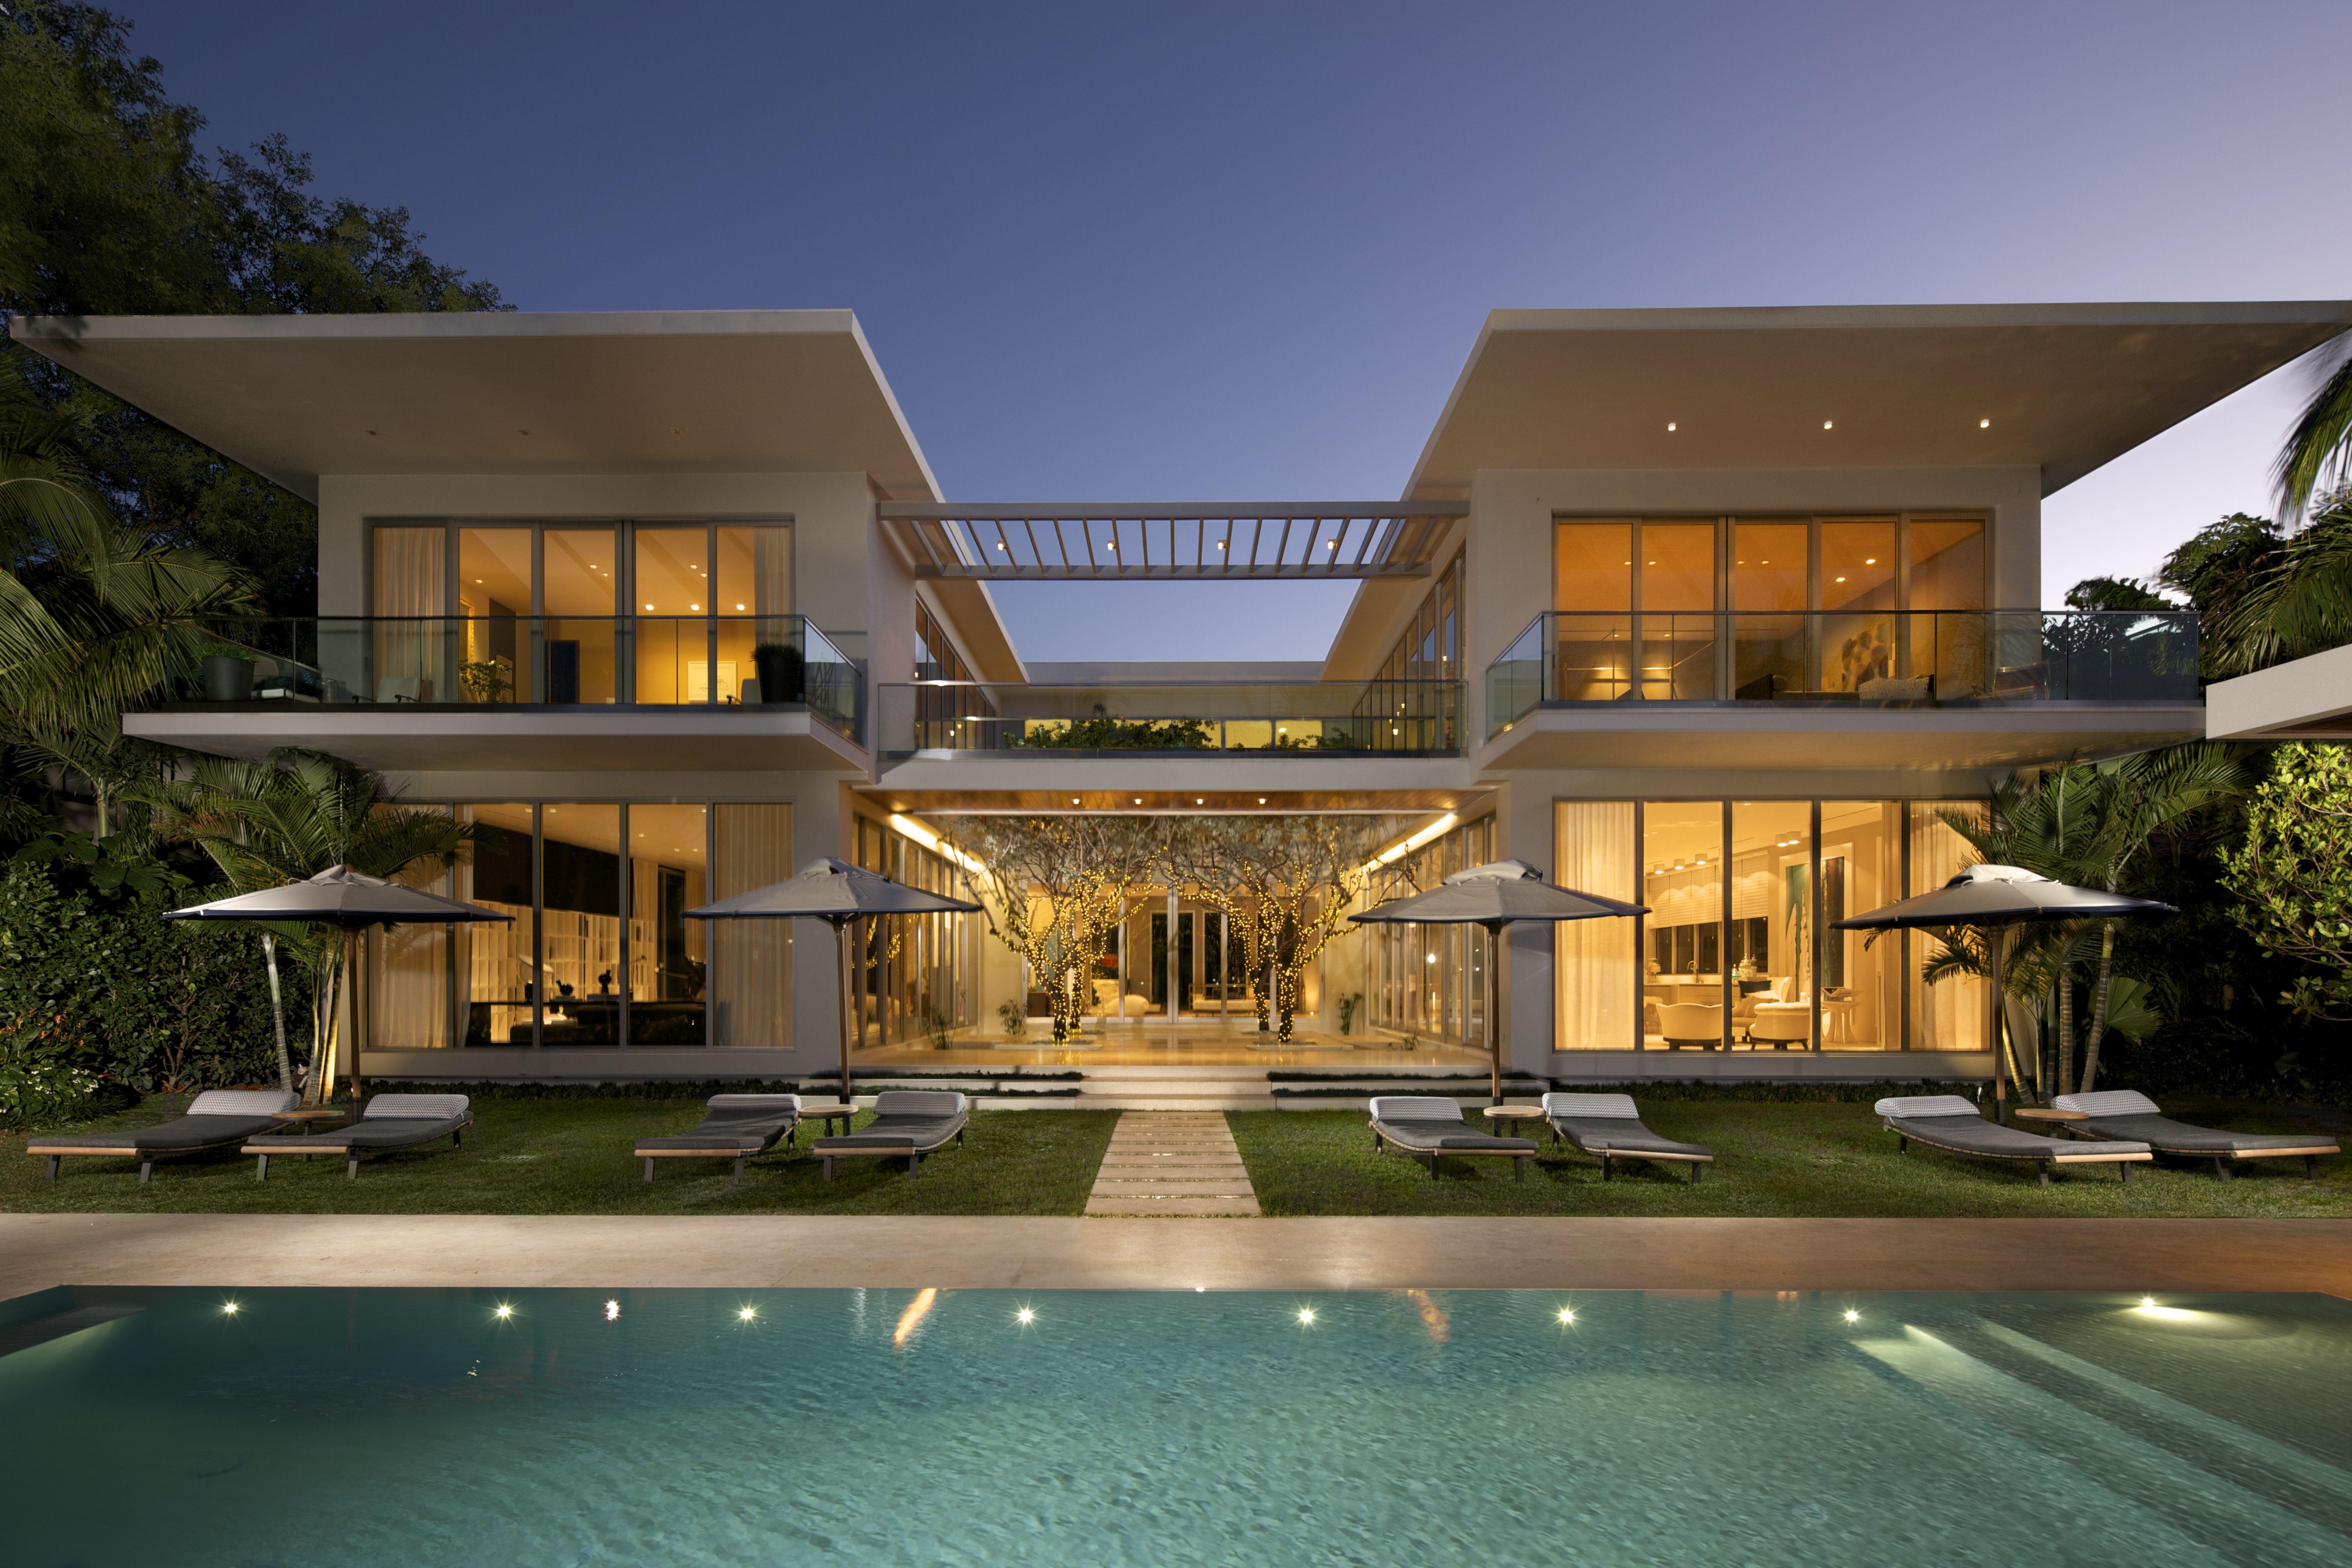 mimo housekobi karp architecture | modern architecture